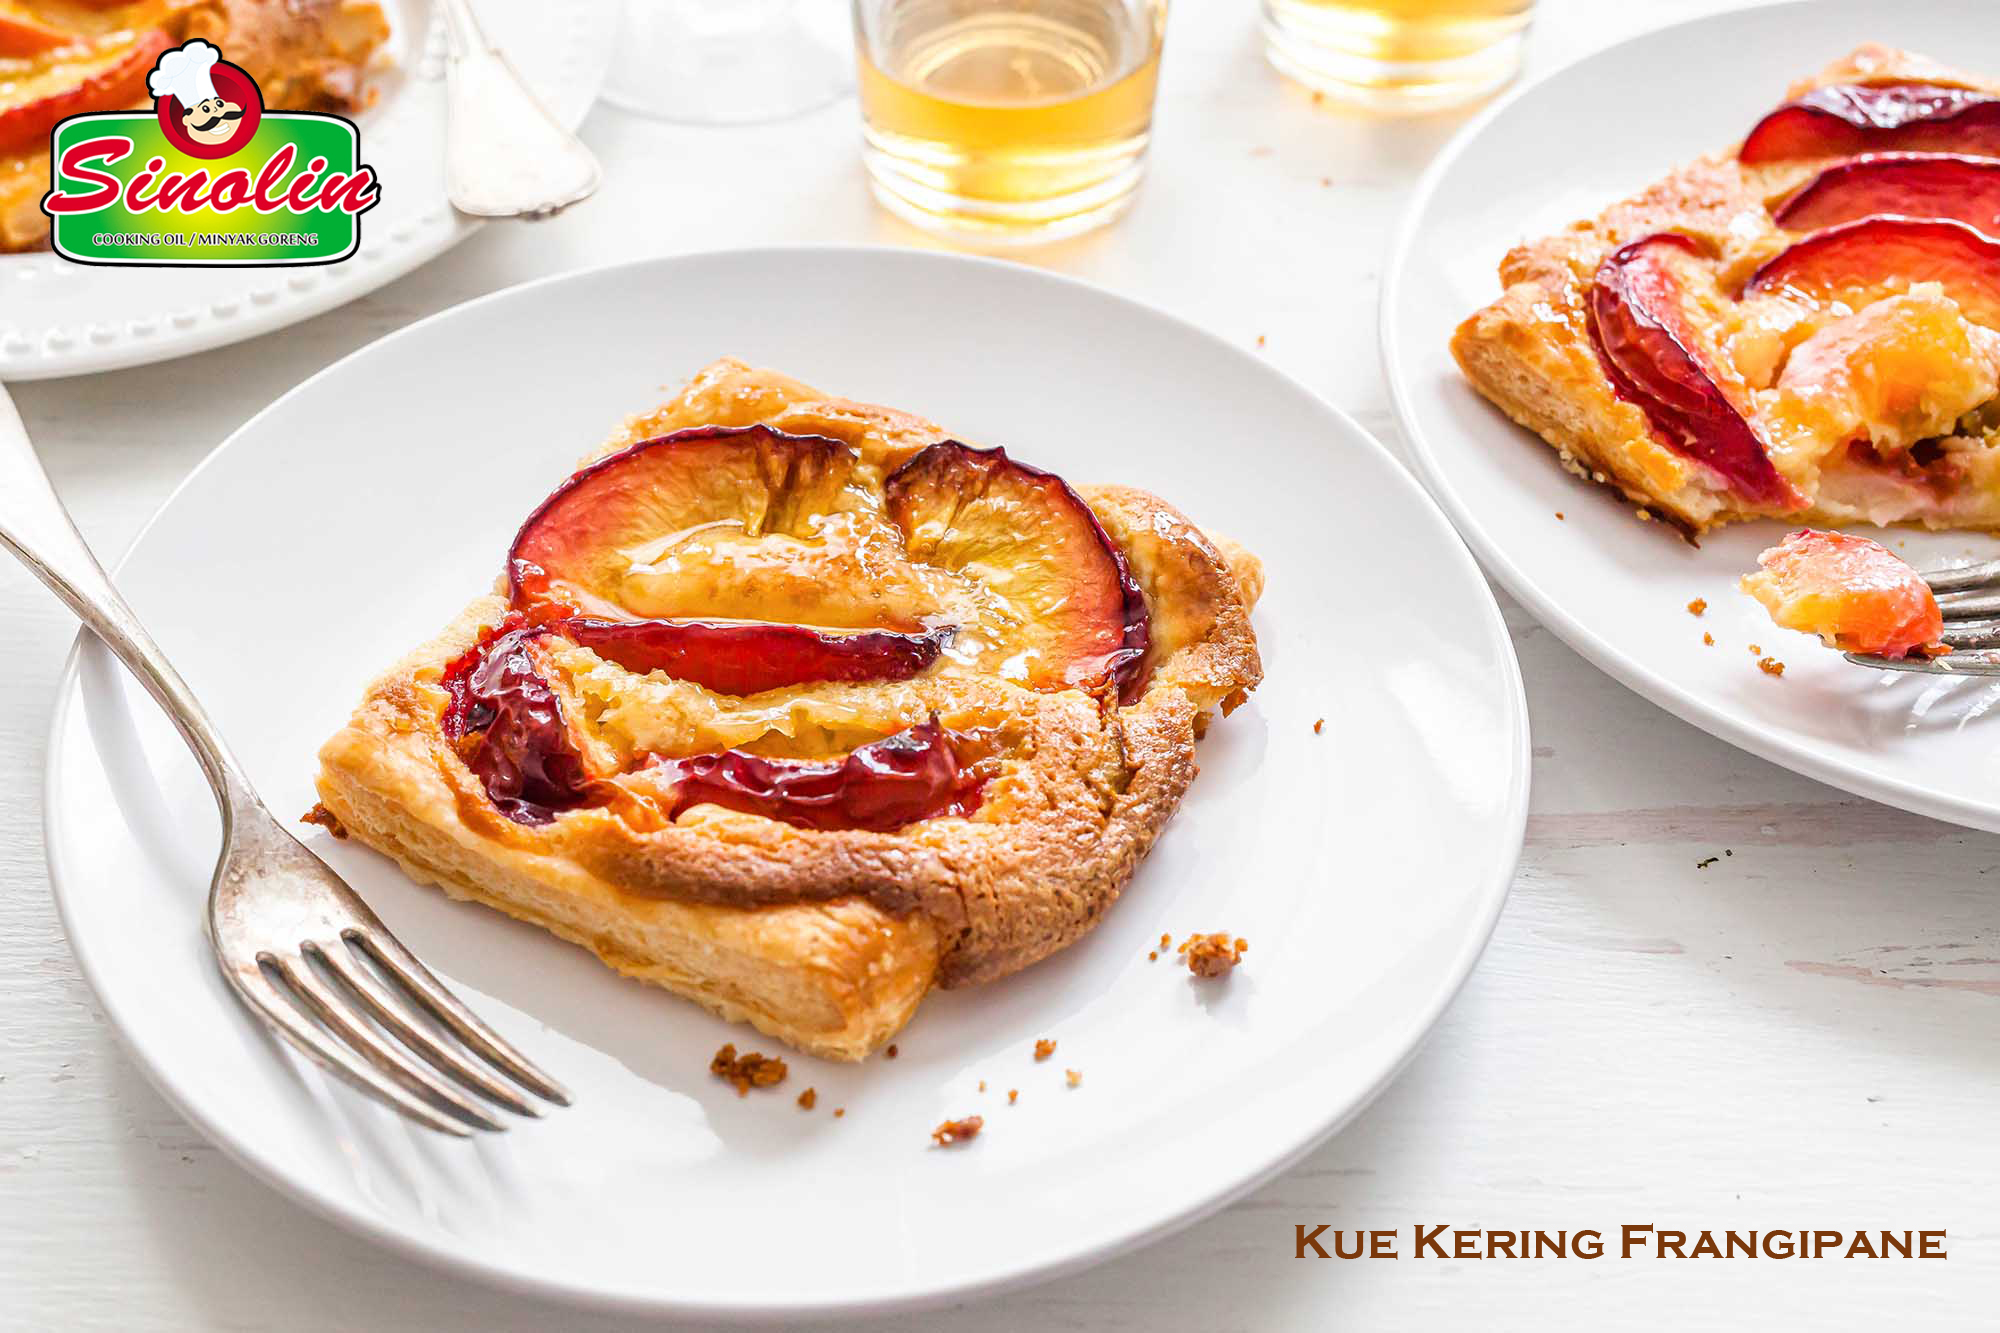 Resep Kue Kering Frangipane Puff Pastry oleh Dapur Sinolin